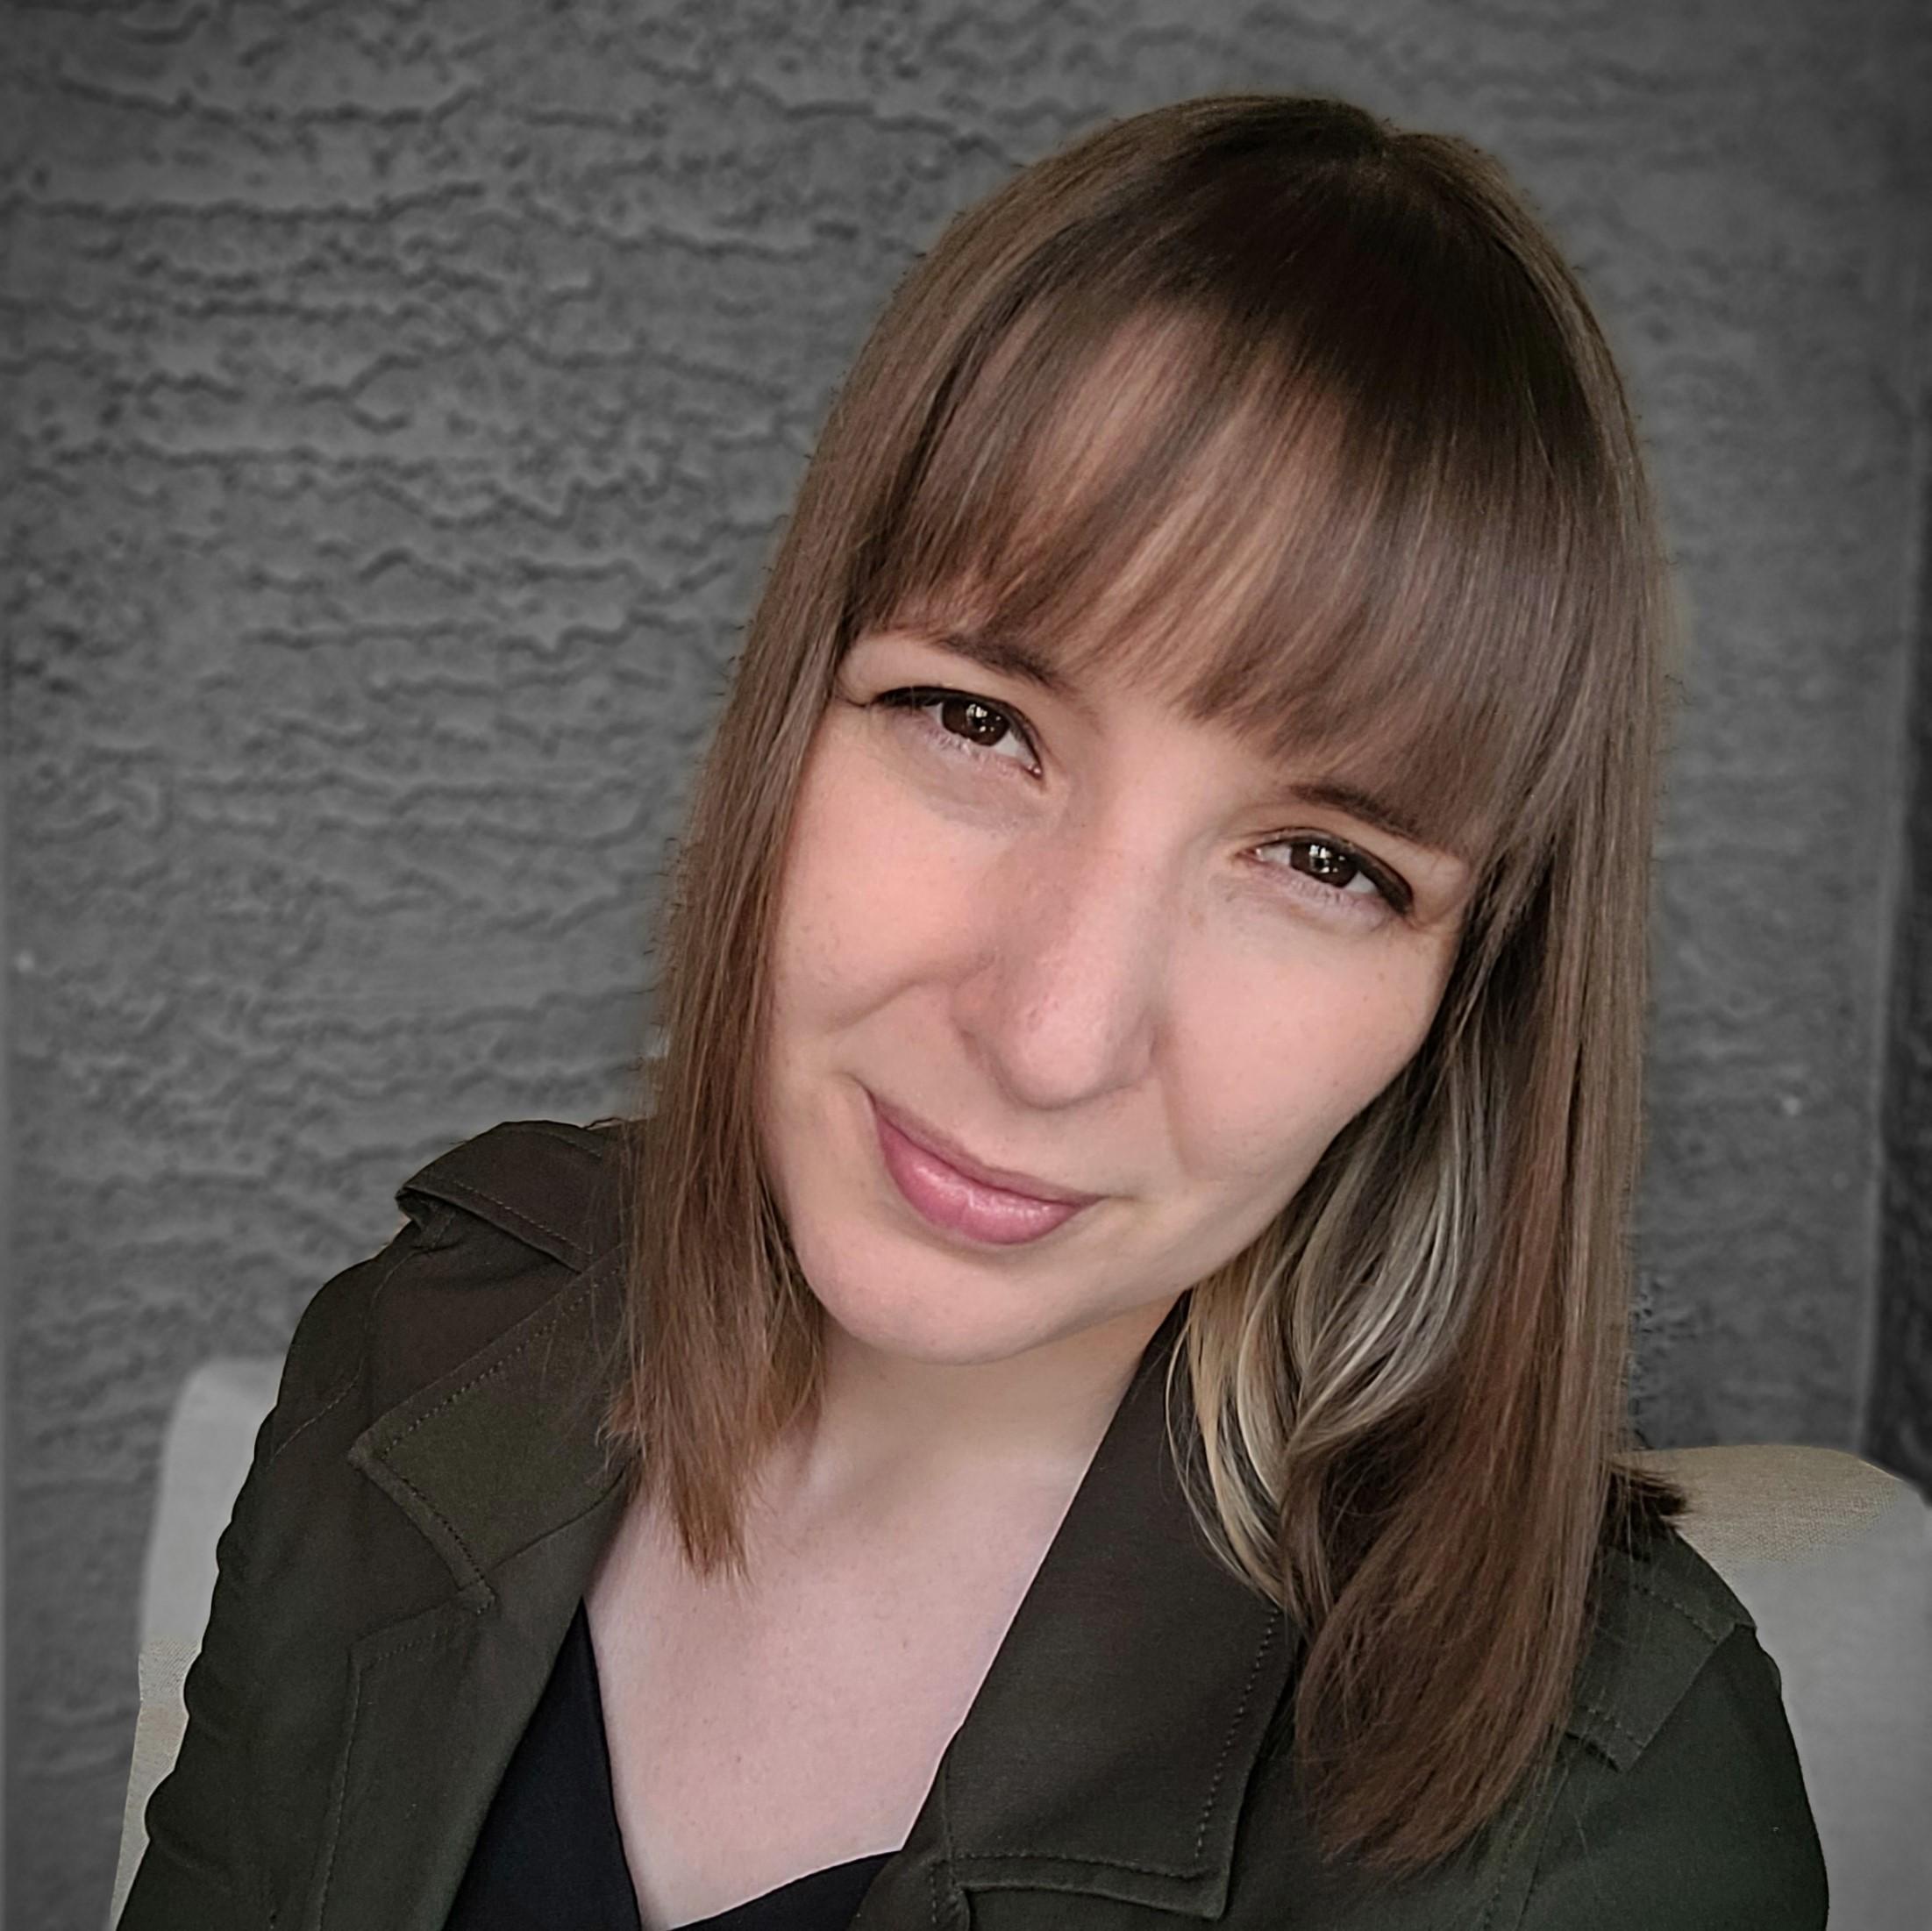 Rachel Kuehl